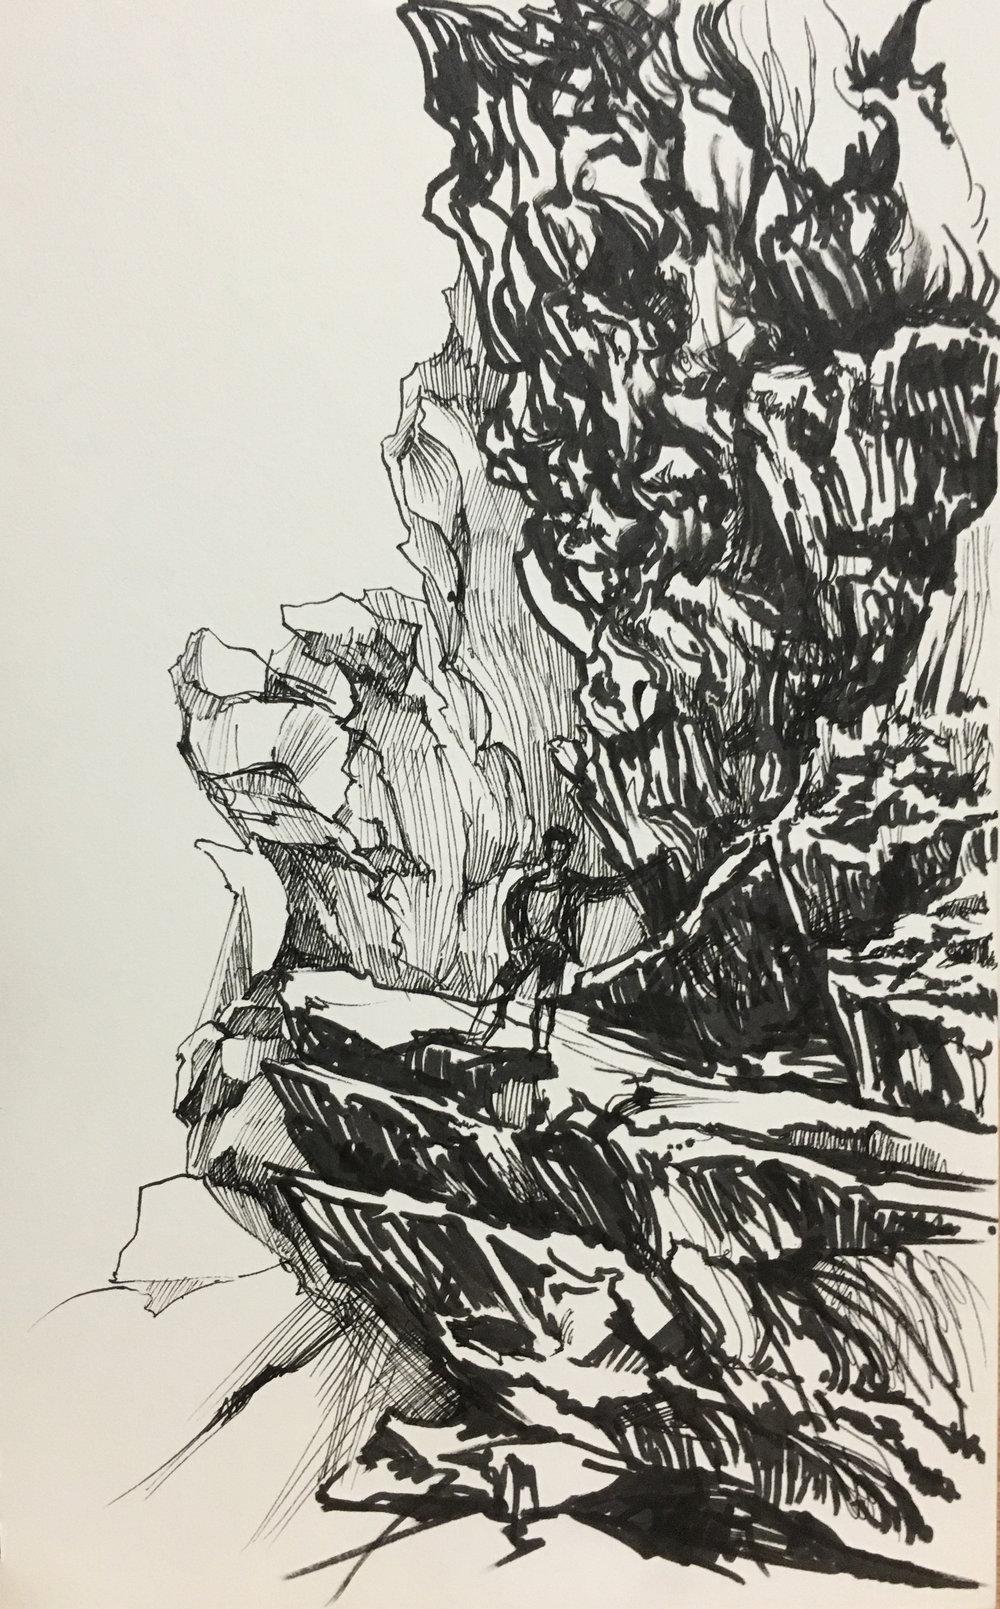 Centerpiece, Rumney